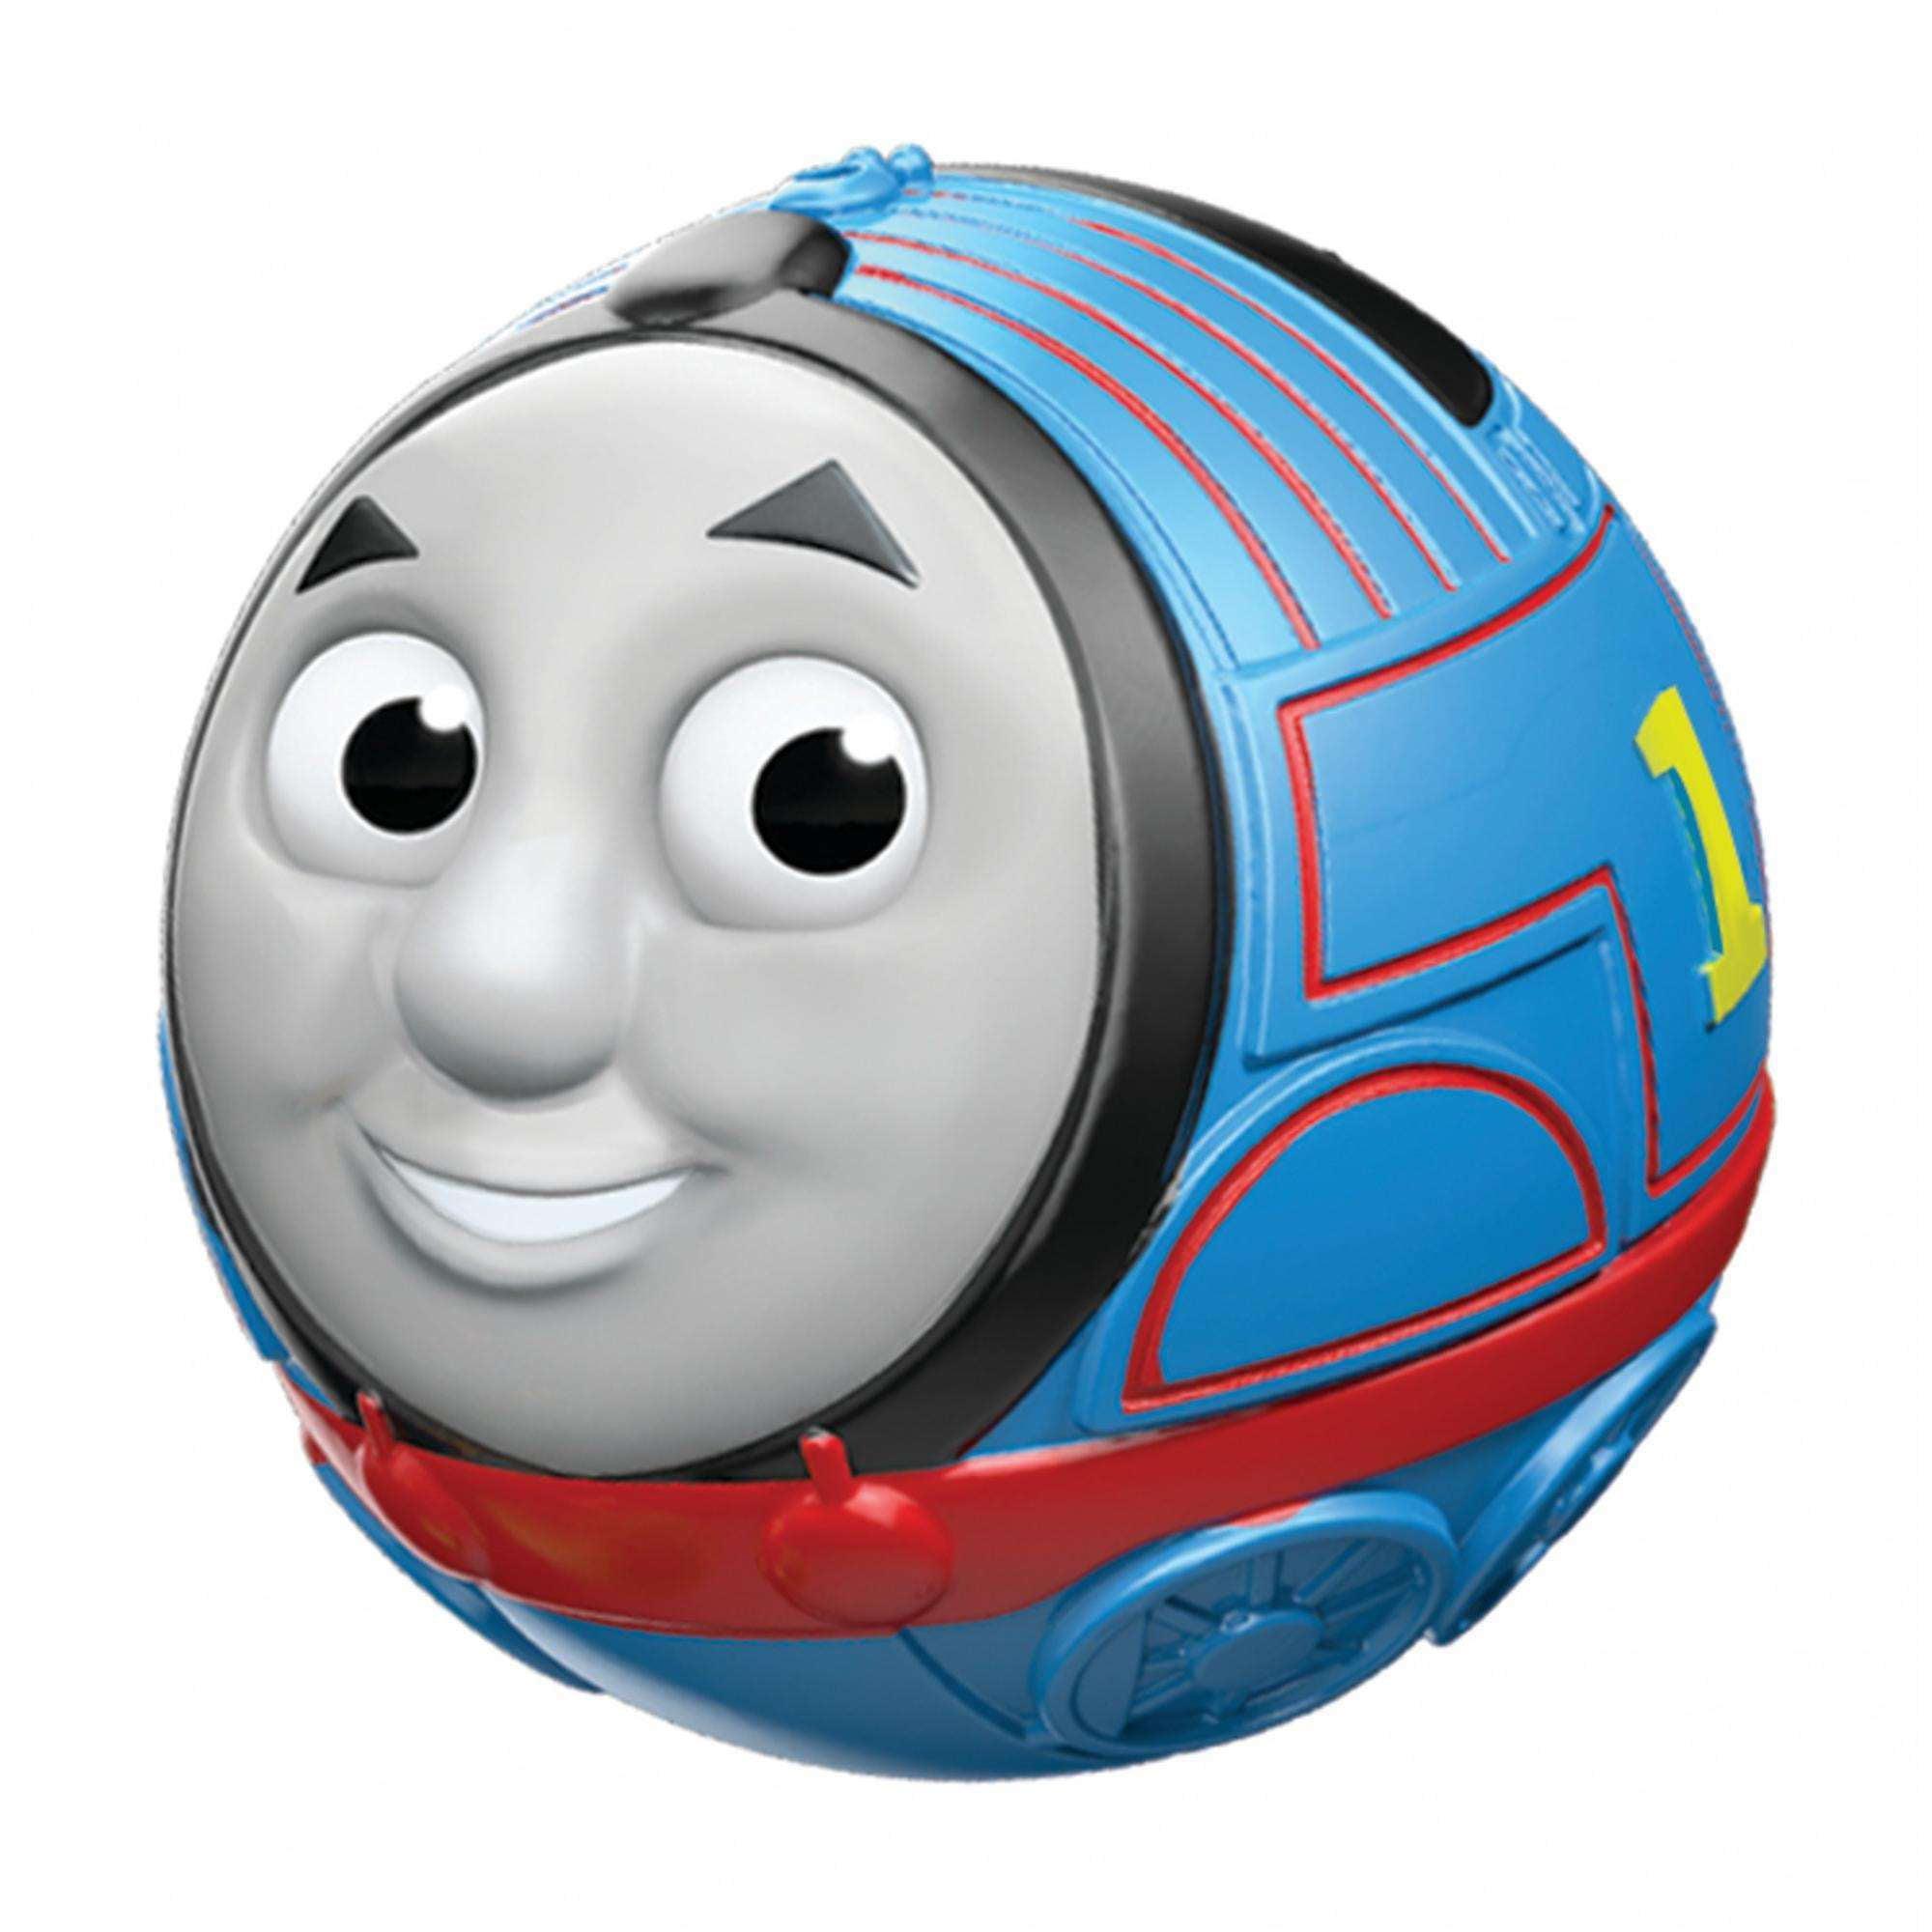 SMALL INFANT BALL THOMAS THE TANK